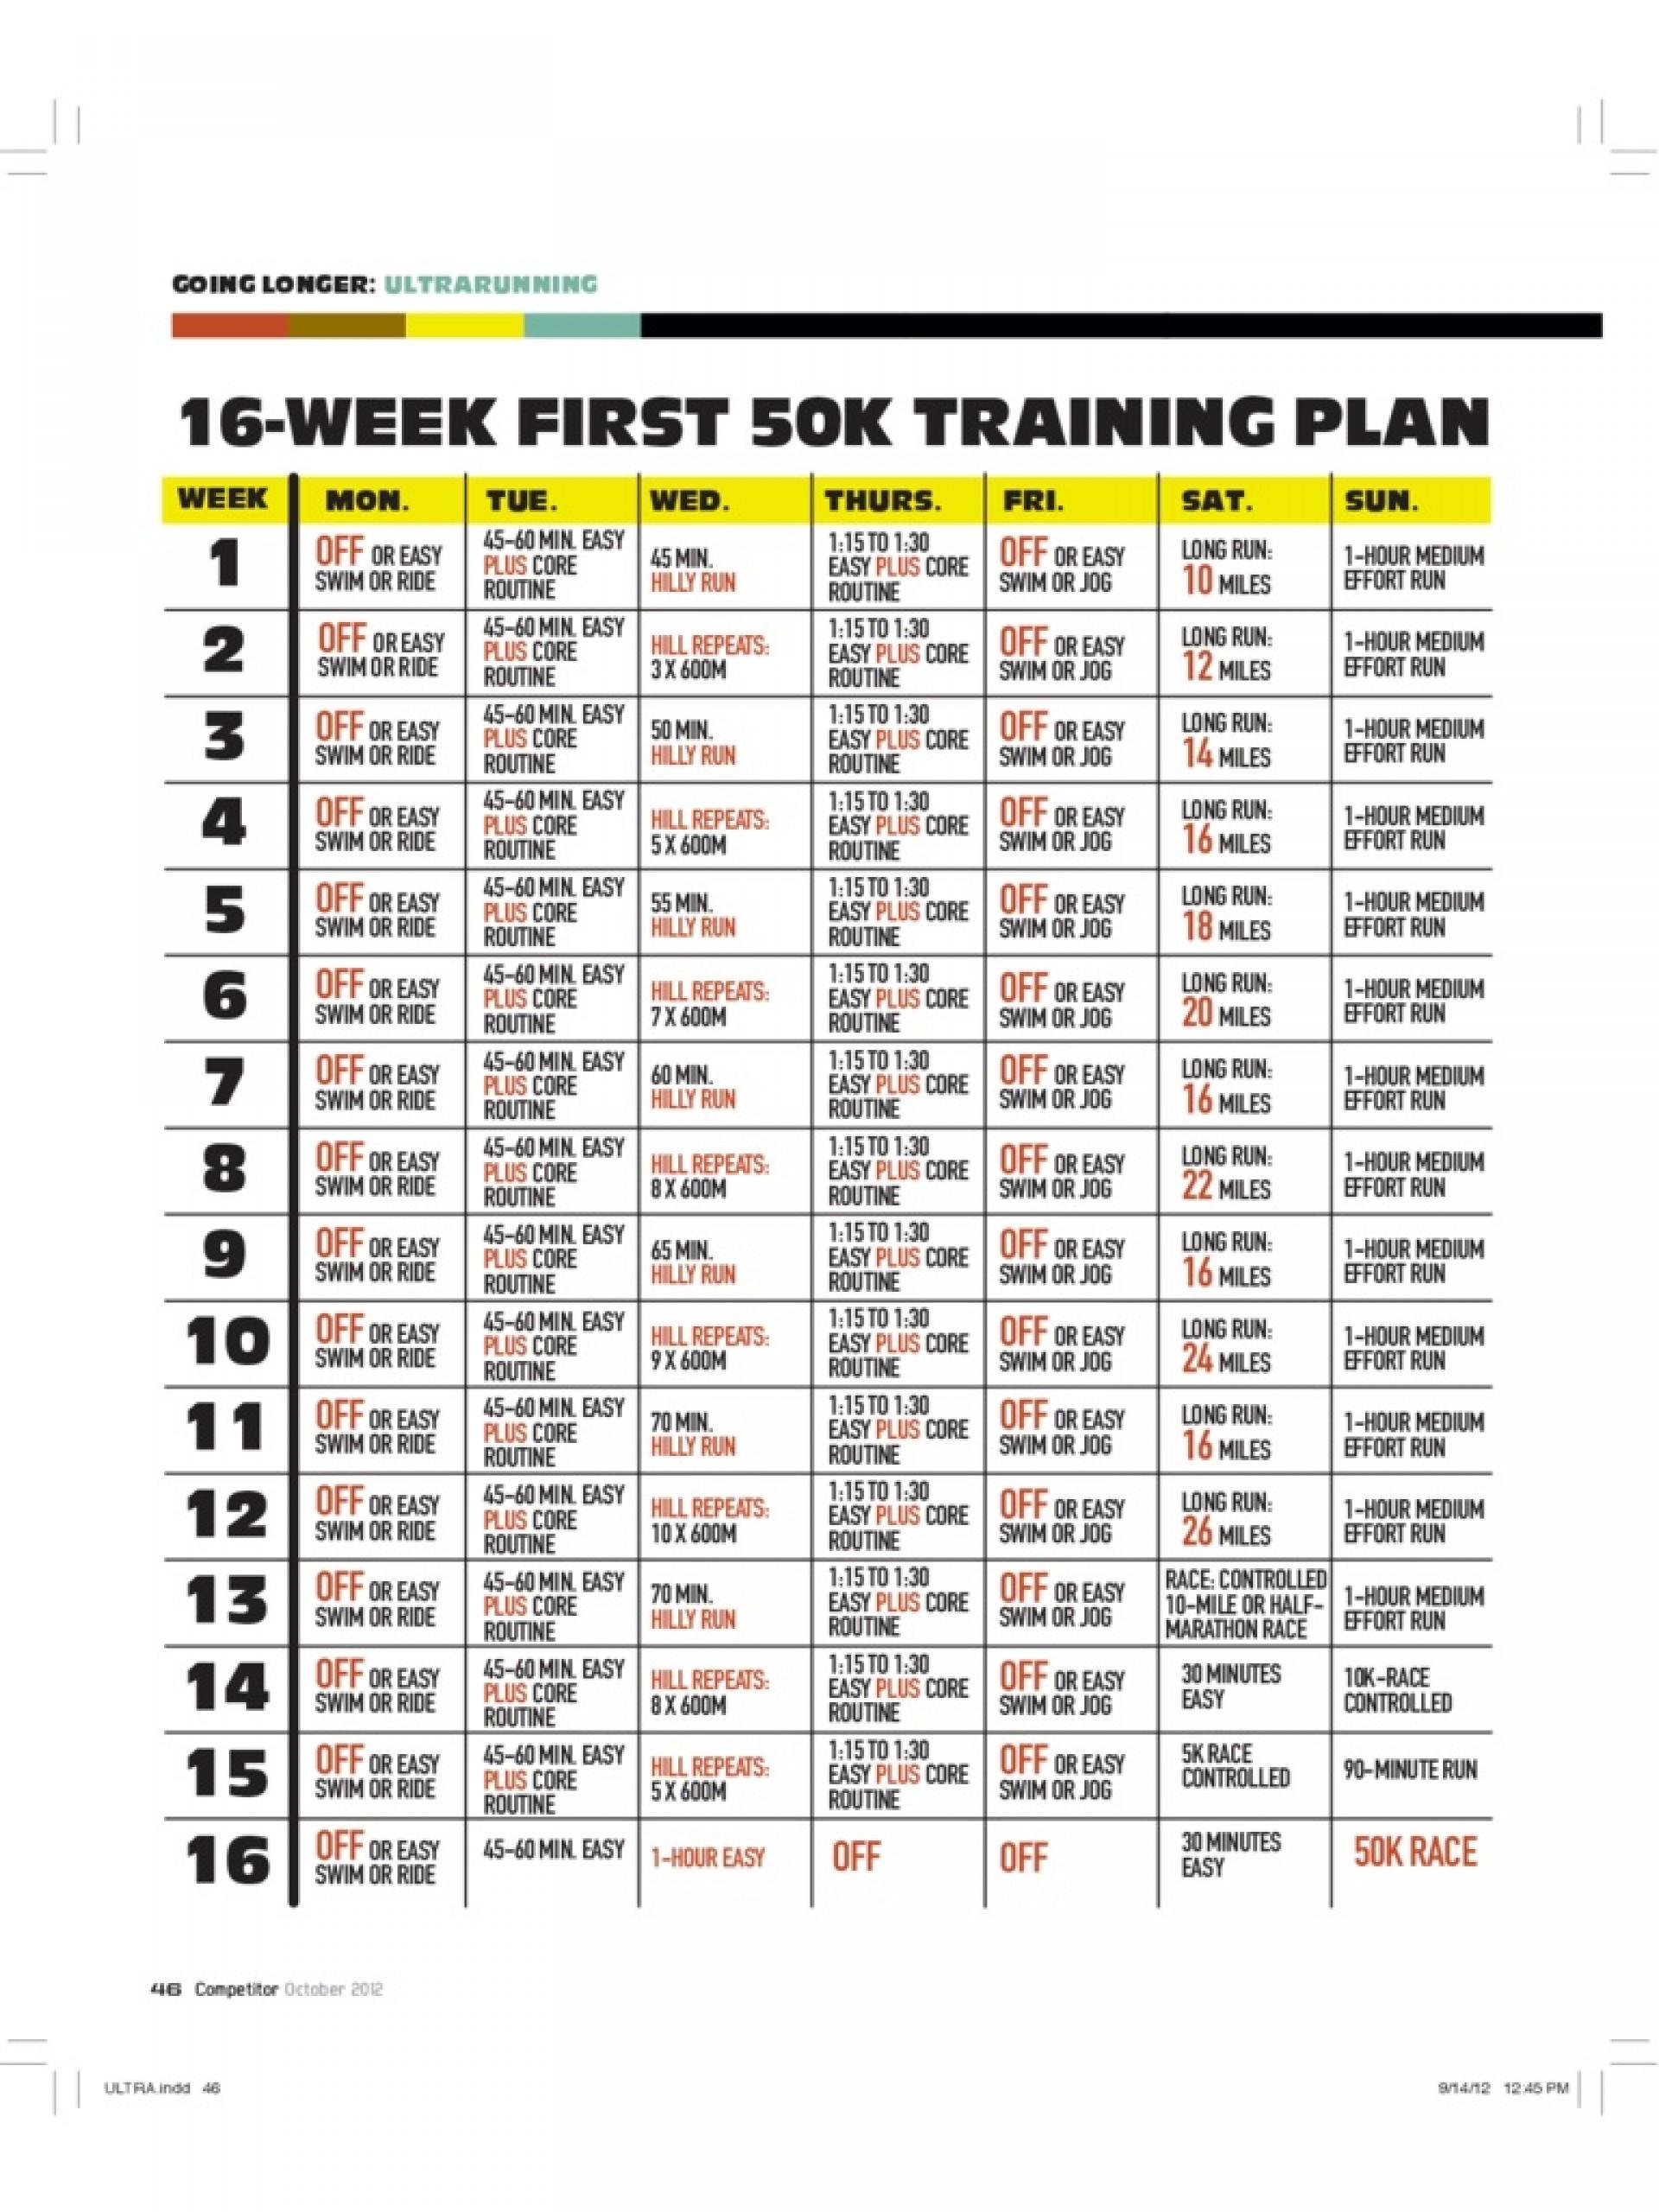 005 Sensational Training Plan Template Excel Inspiration  Free Download Schedule Format1920